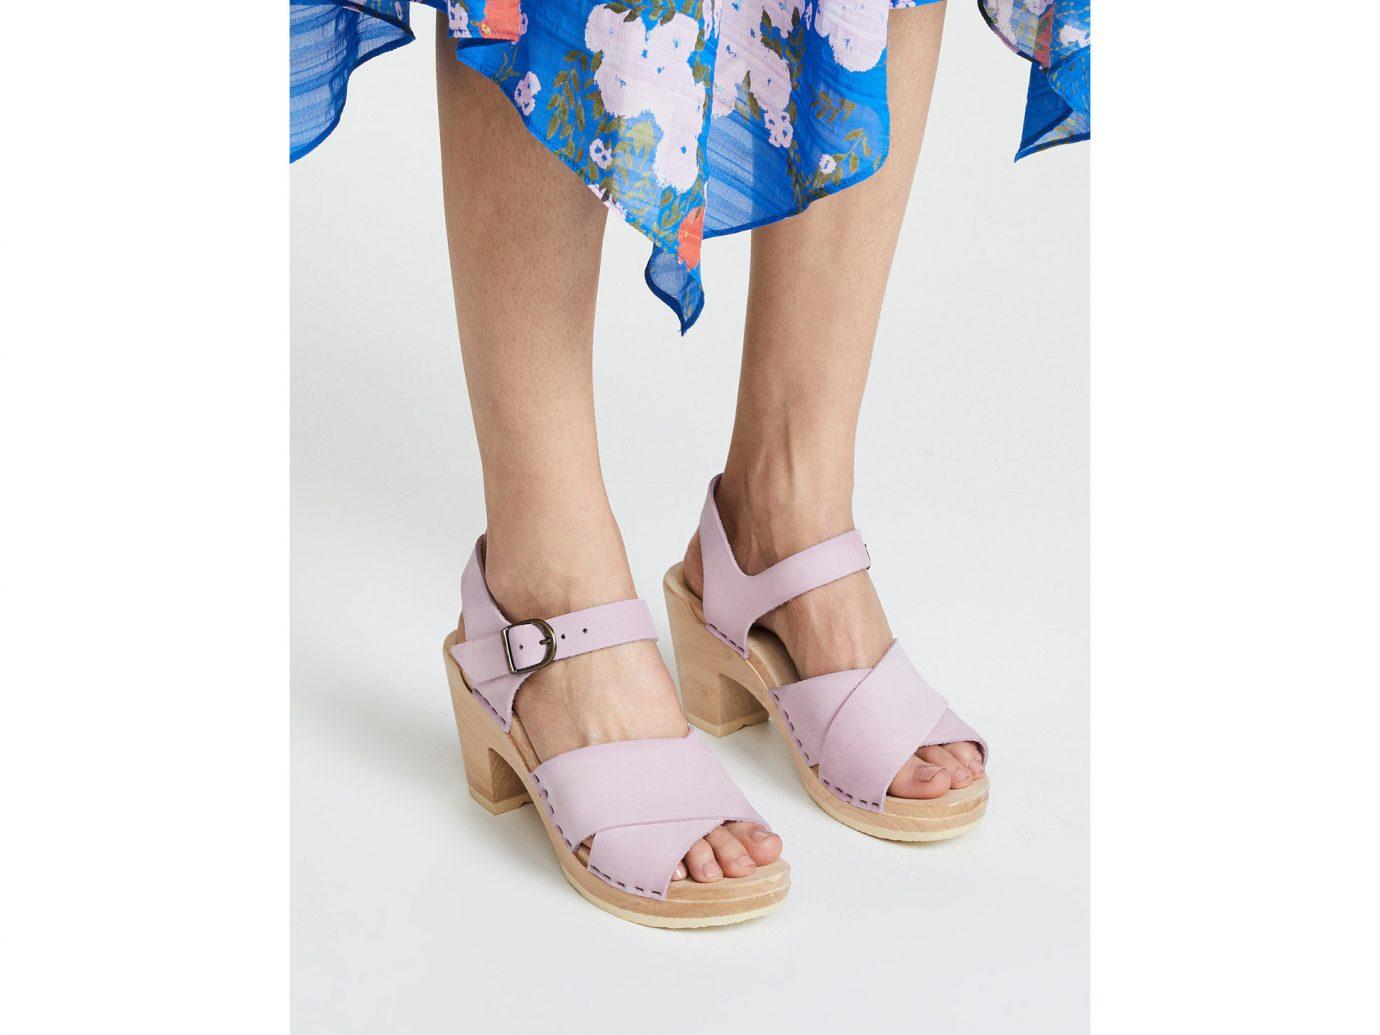 Spring Travel Style + Design Travel Shop footwear shoe person sandal joint human leg ankle outdoor shoe leg high heeled footwear